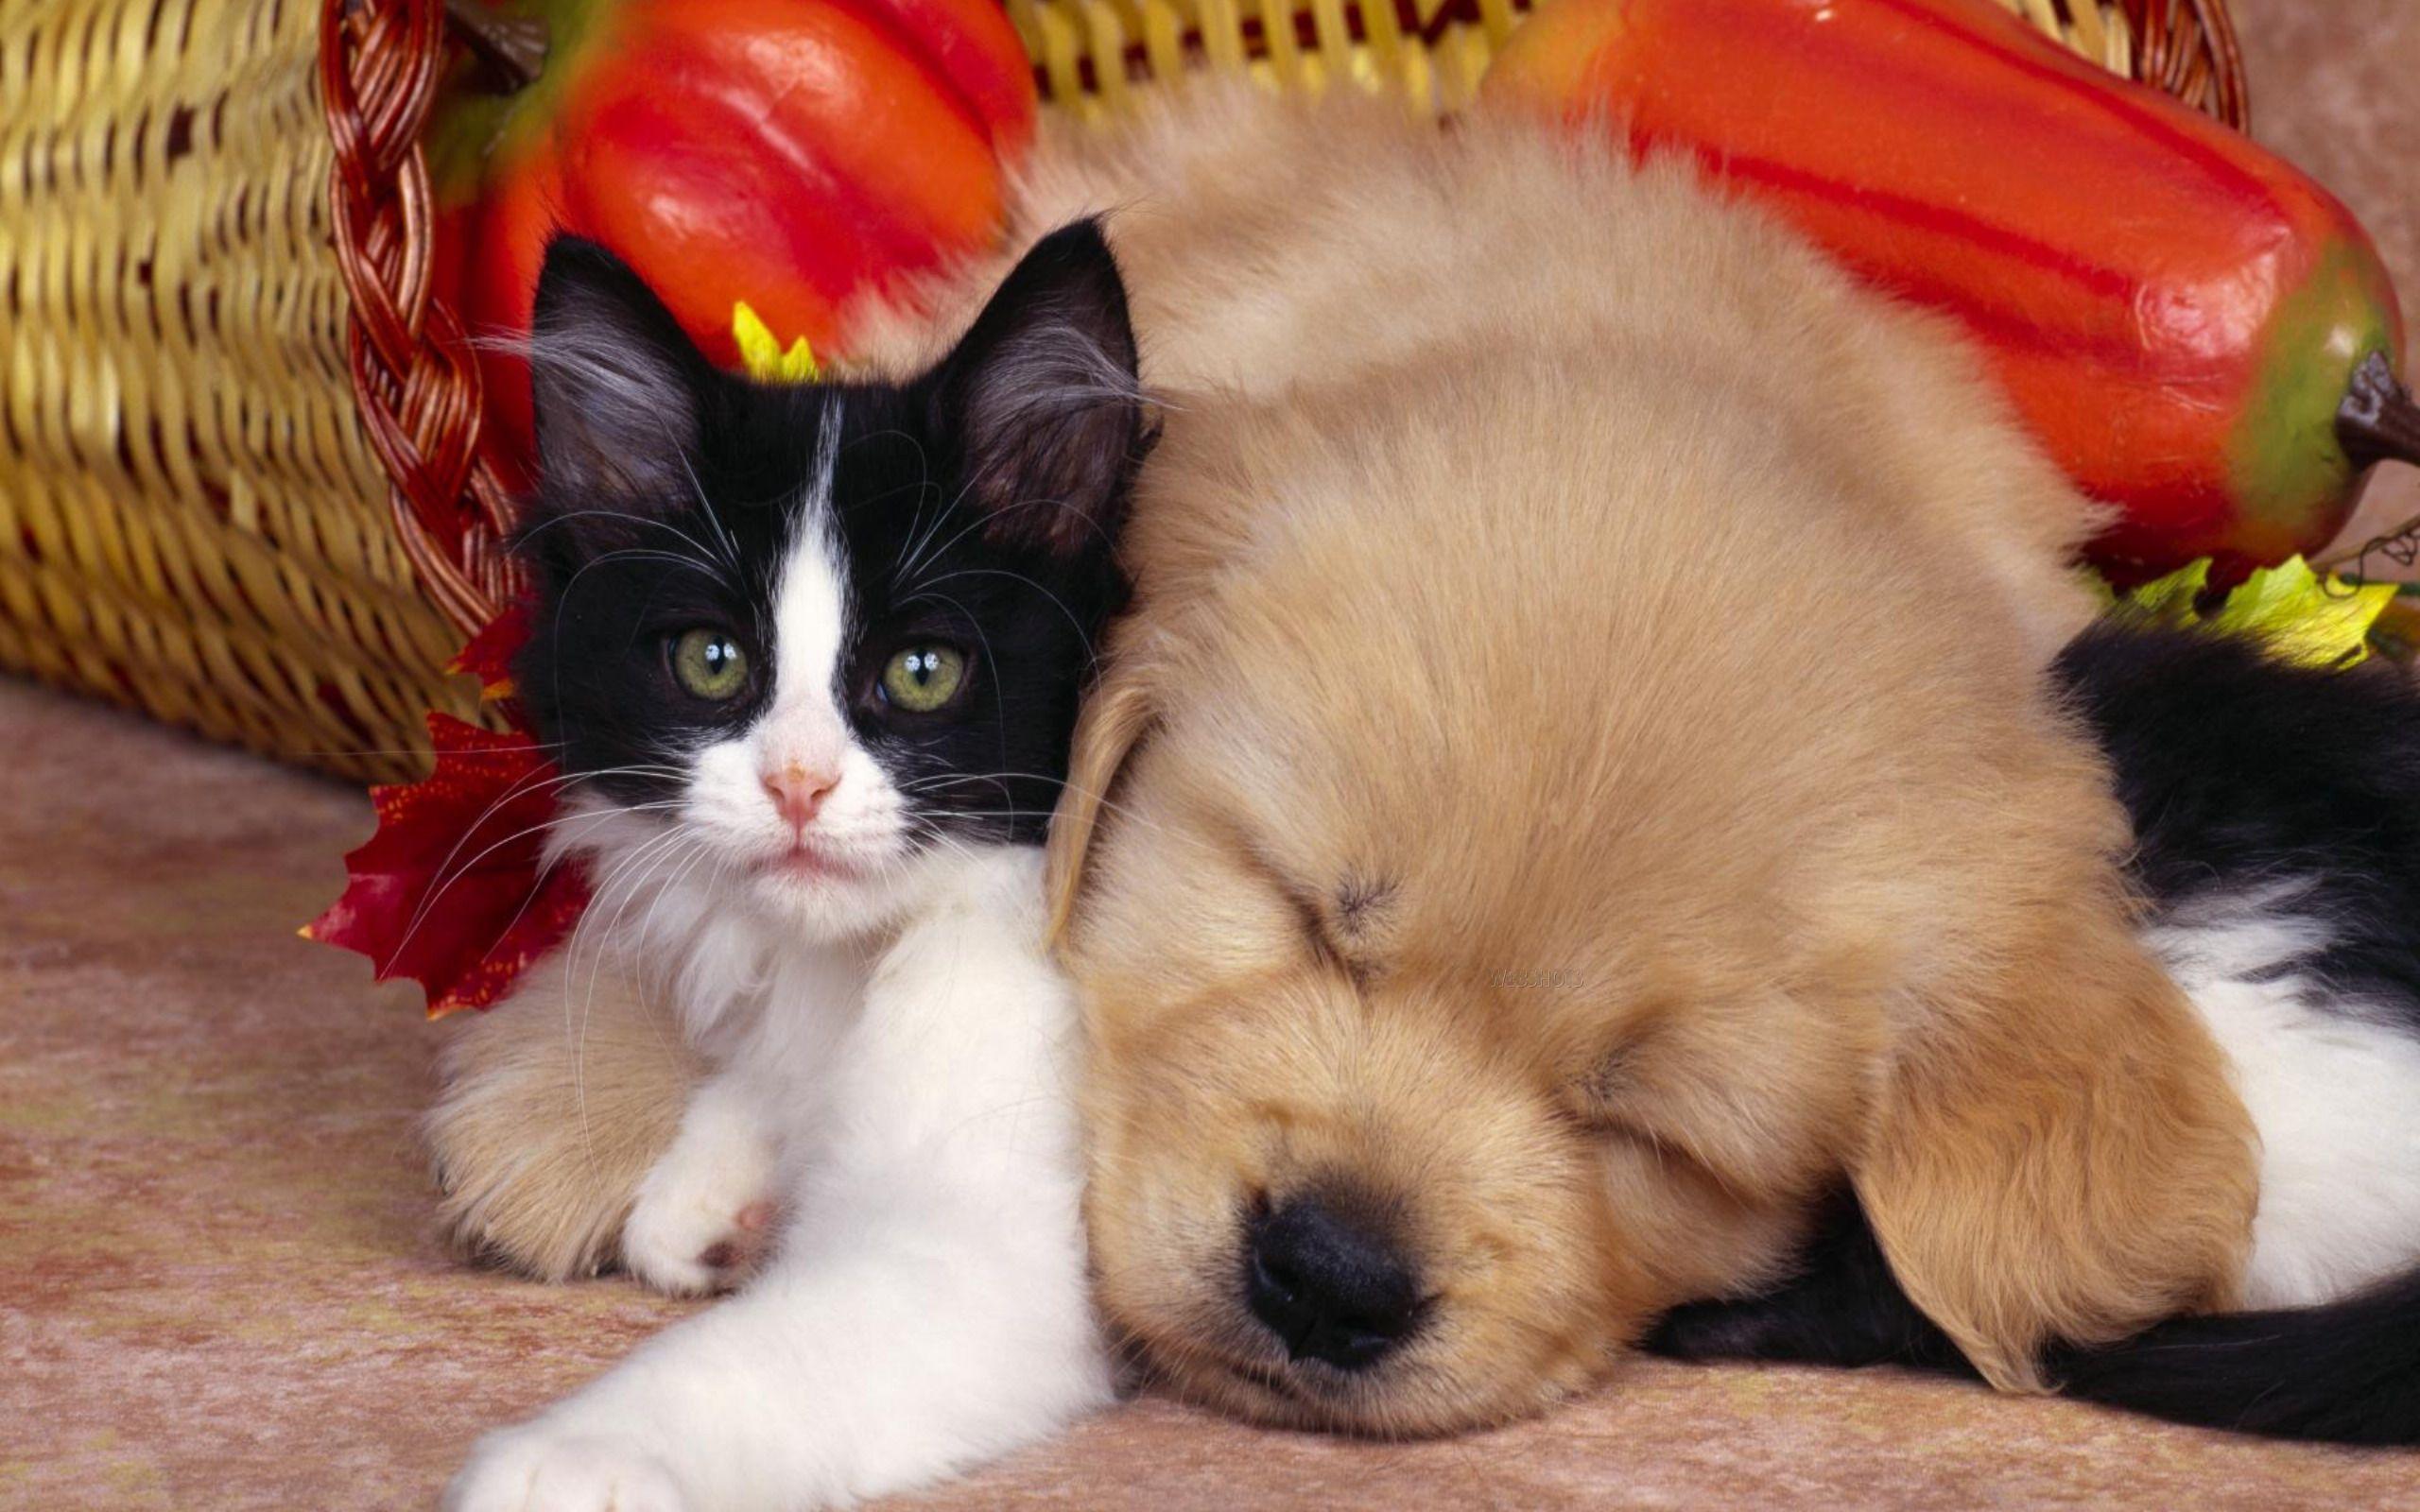 Umm Don T Ask About The Background All I Know Is That There S A Cute Sleeping Puppy On Me Cute Ani Mit Bildern Susse Hunde Und Katzen Bezaubernde Katzchen Susse Katzen